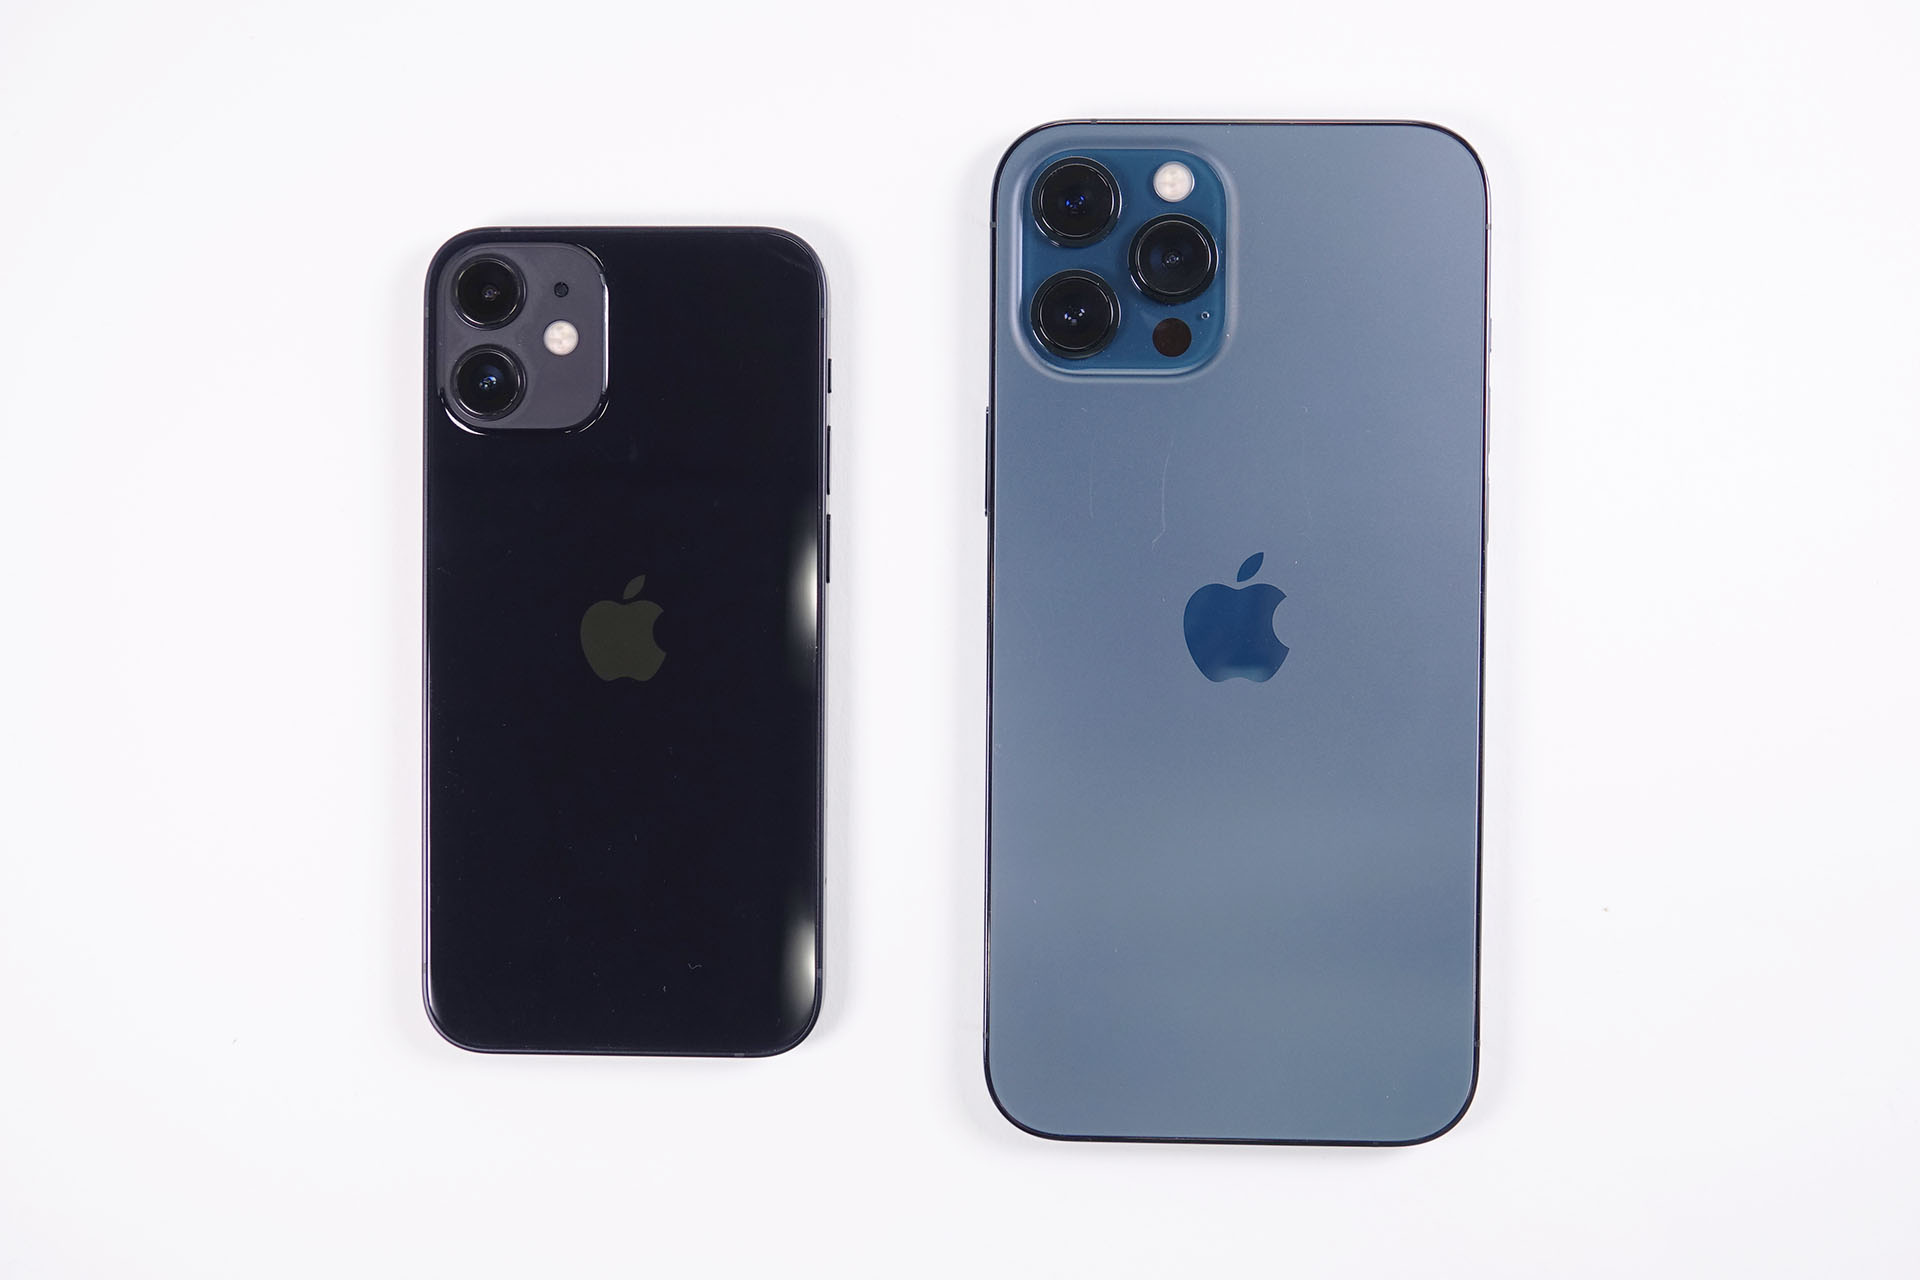 iPhone 12 mini(左)とiPhone 12 Pro(右)